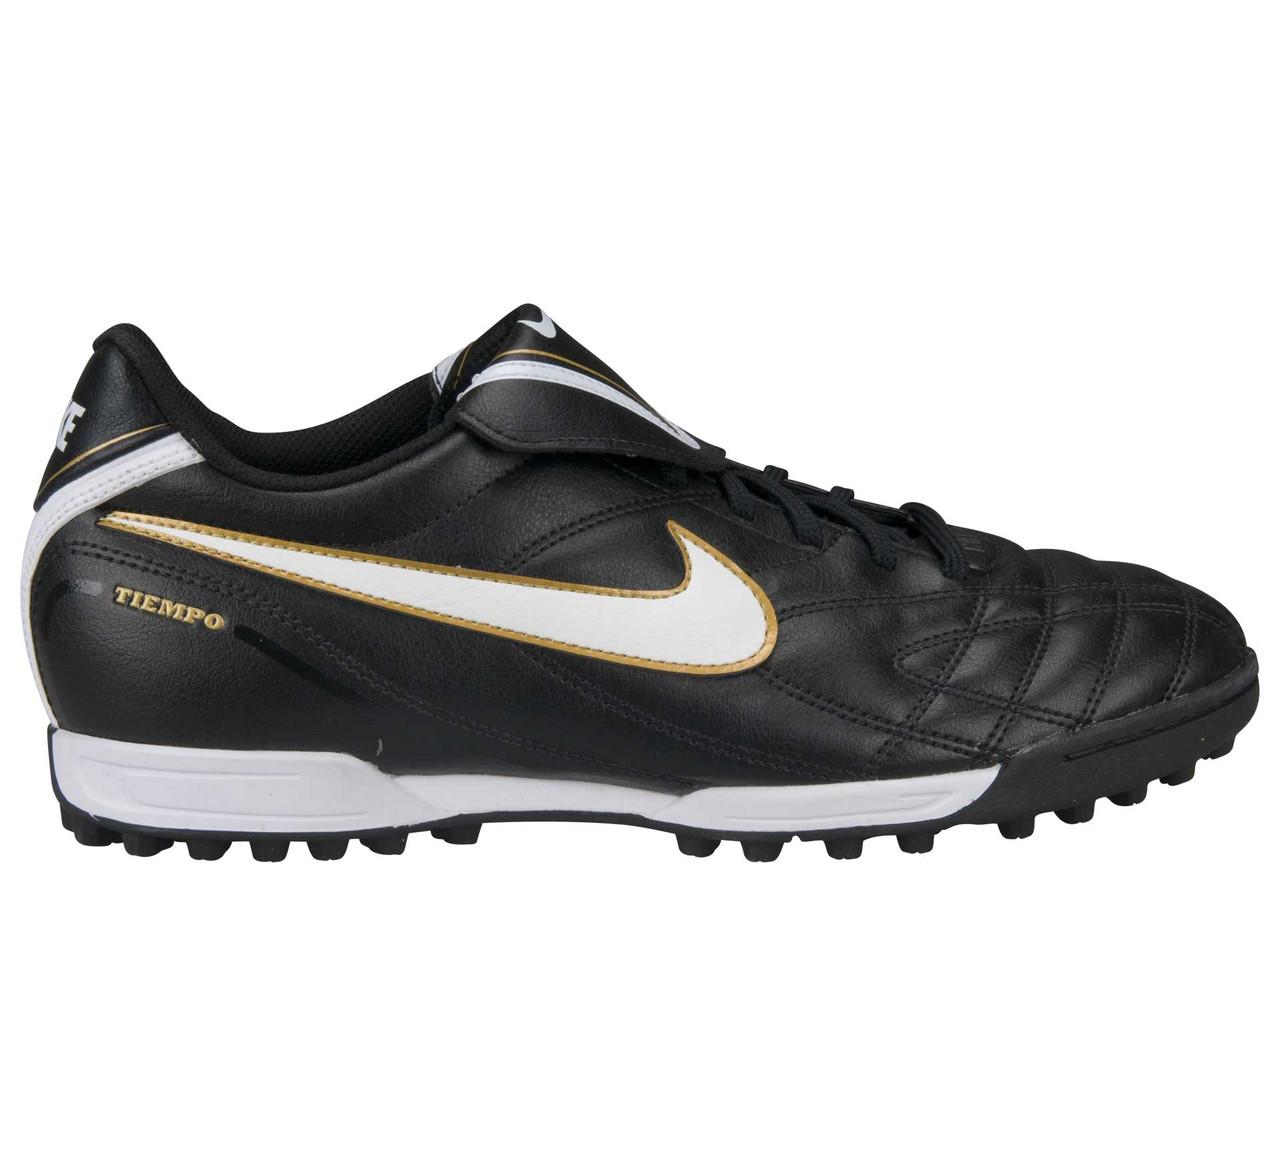 Кроссовки Nike titmpo natural